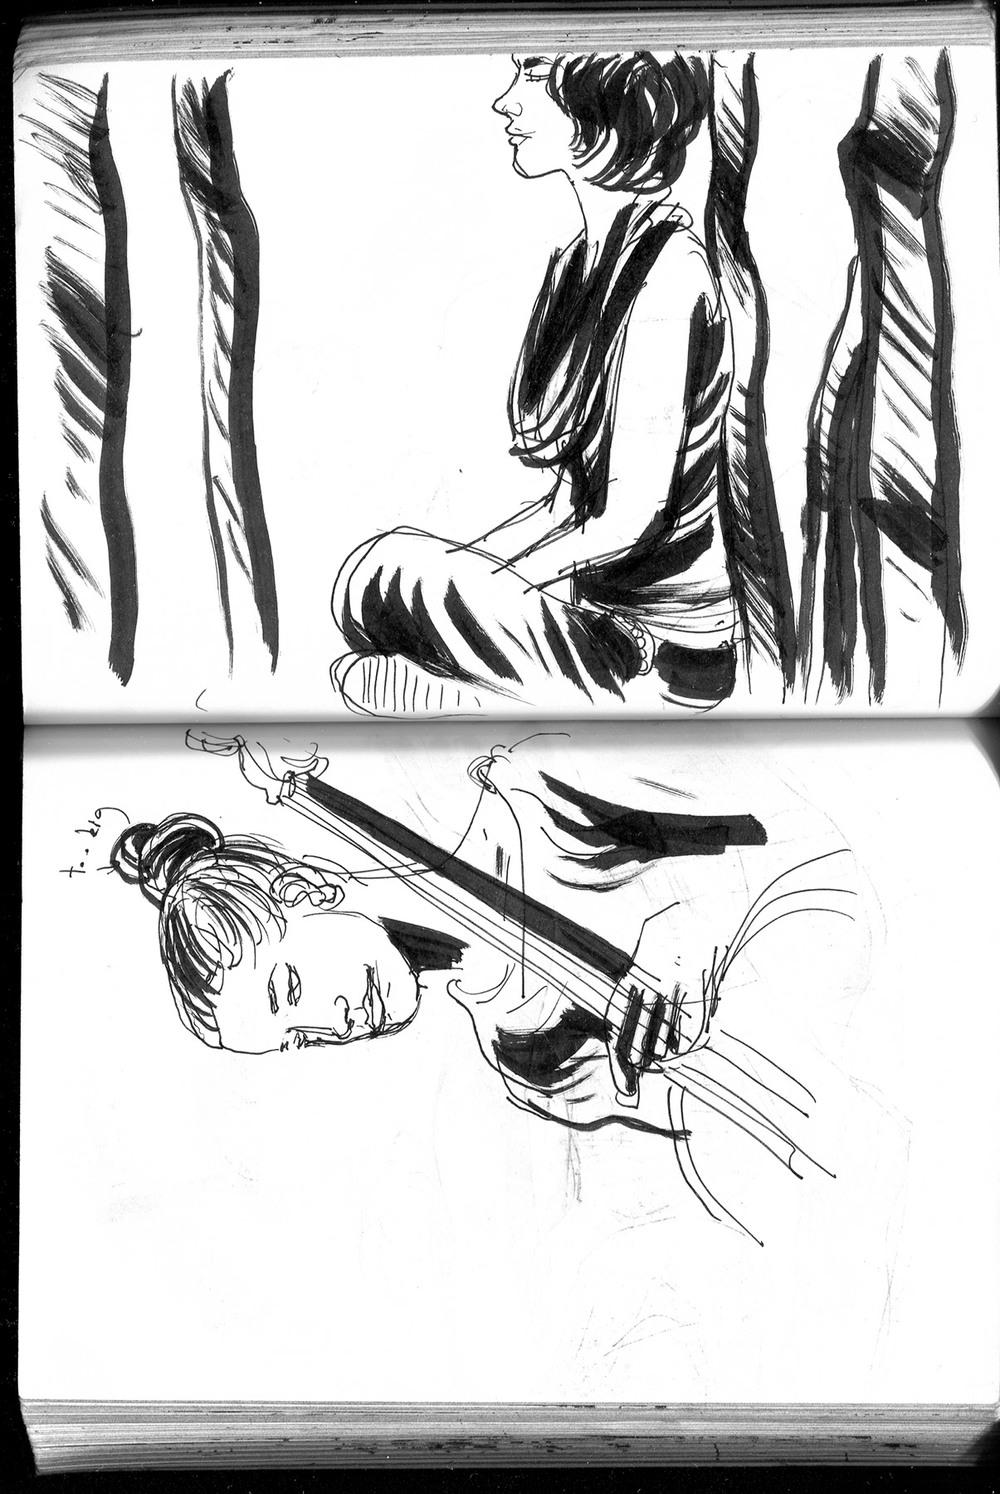 davidm_sketches_2014_08-056.jpg